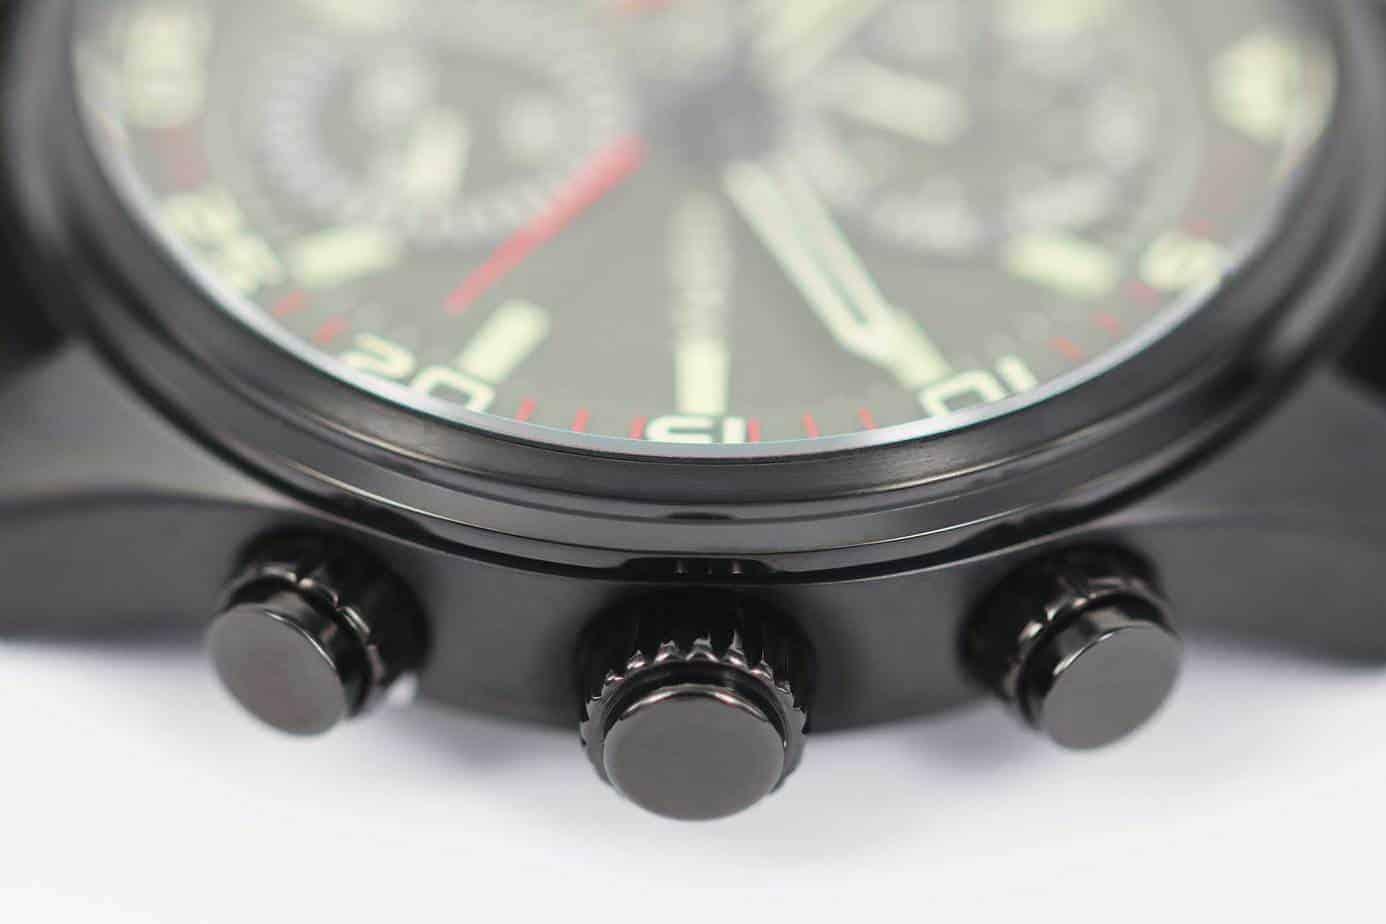 prisma horloge aviator watch edition groen horloge herenhorloge kwaliteit quality